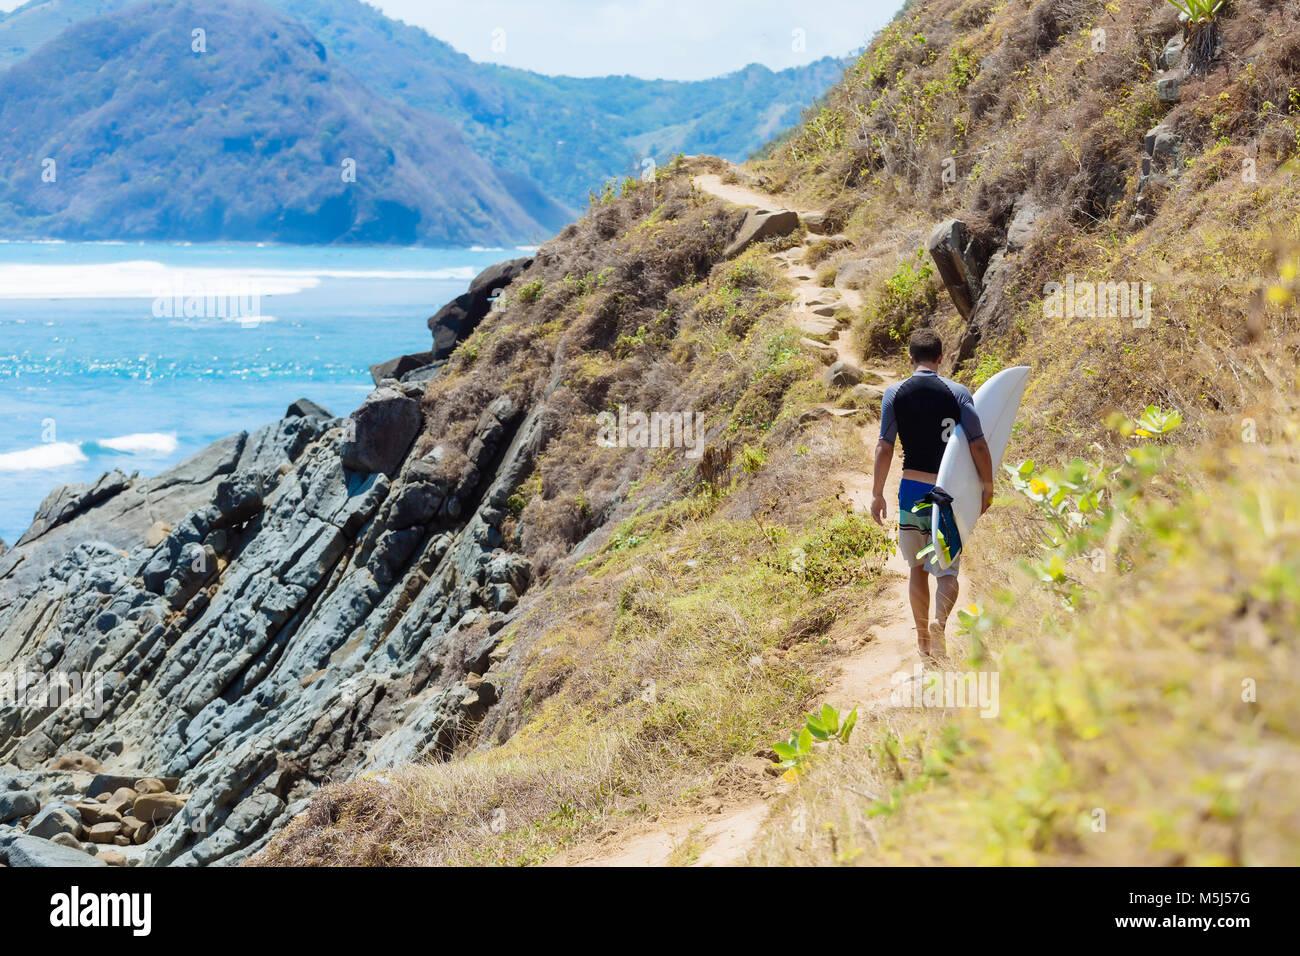 Indonesia, Lombok, surfer walking at ocean coastline - Stock Image